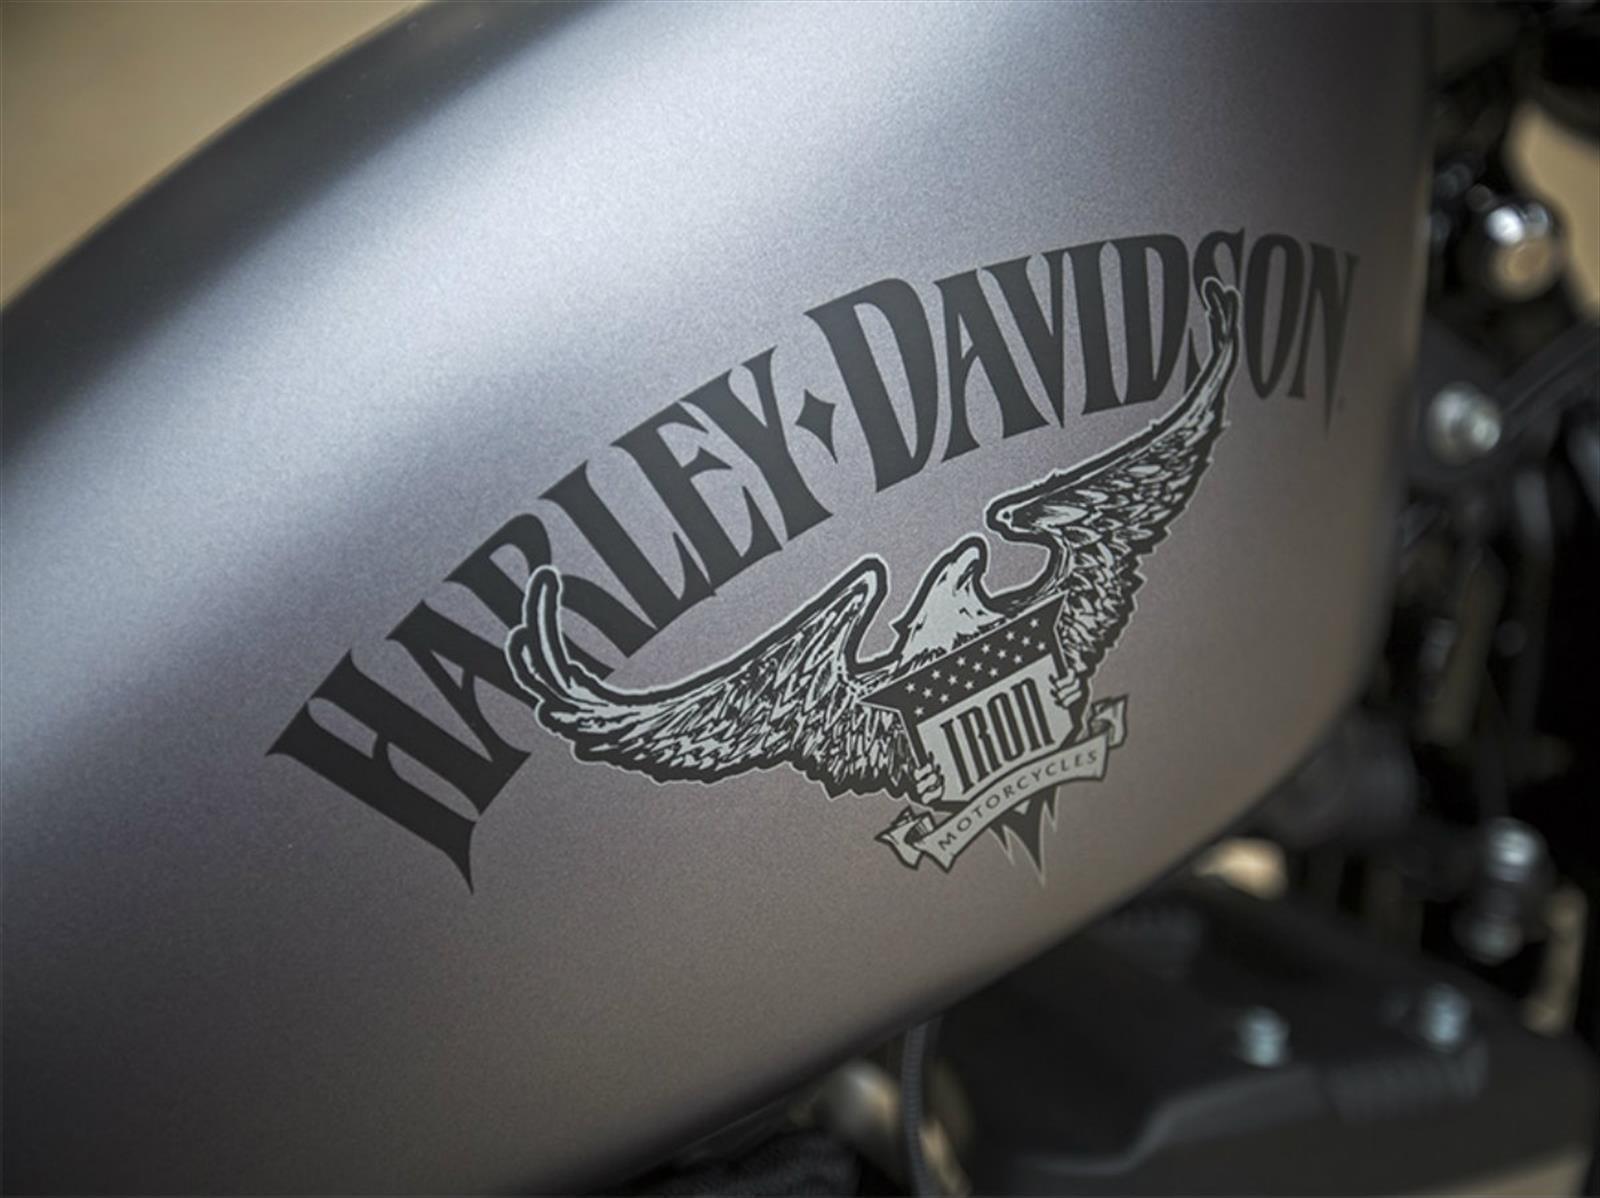 Harley Davidson podría adquirir Ducati